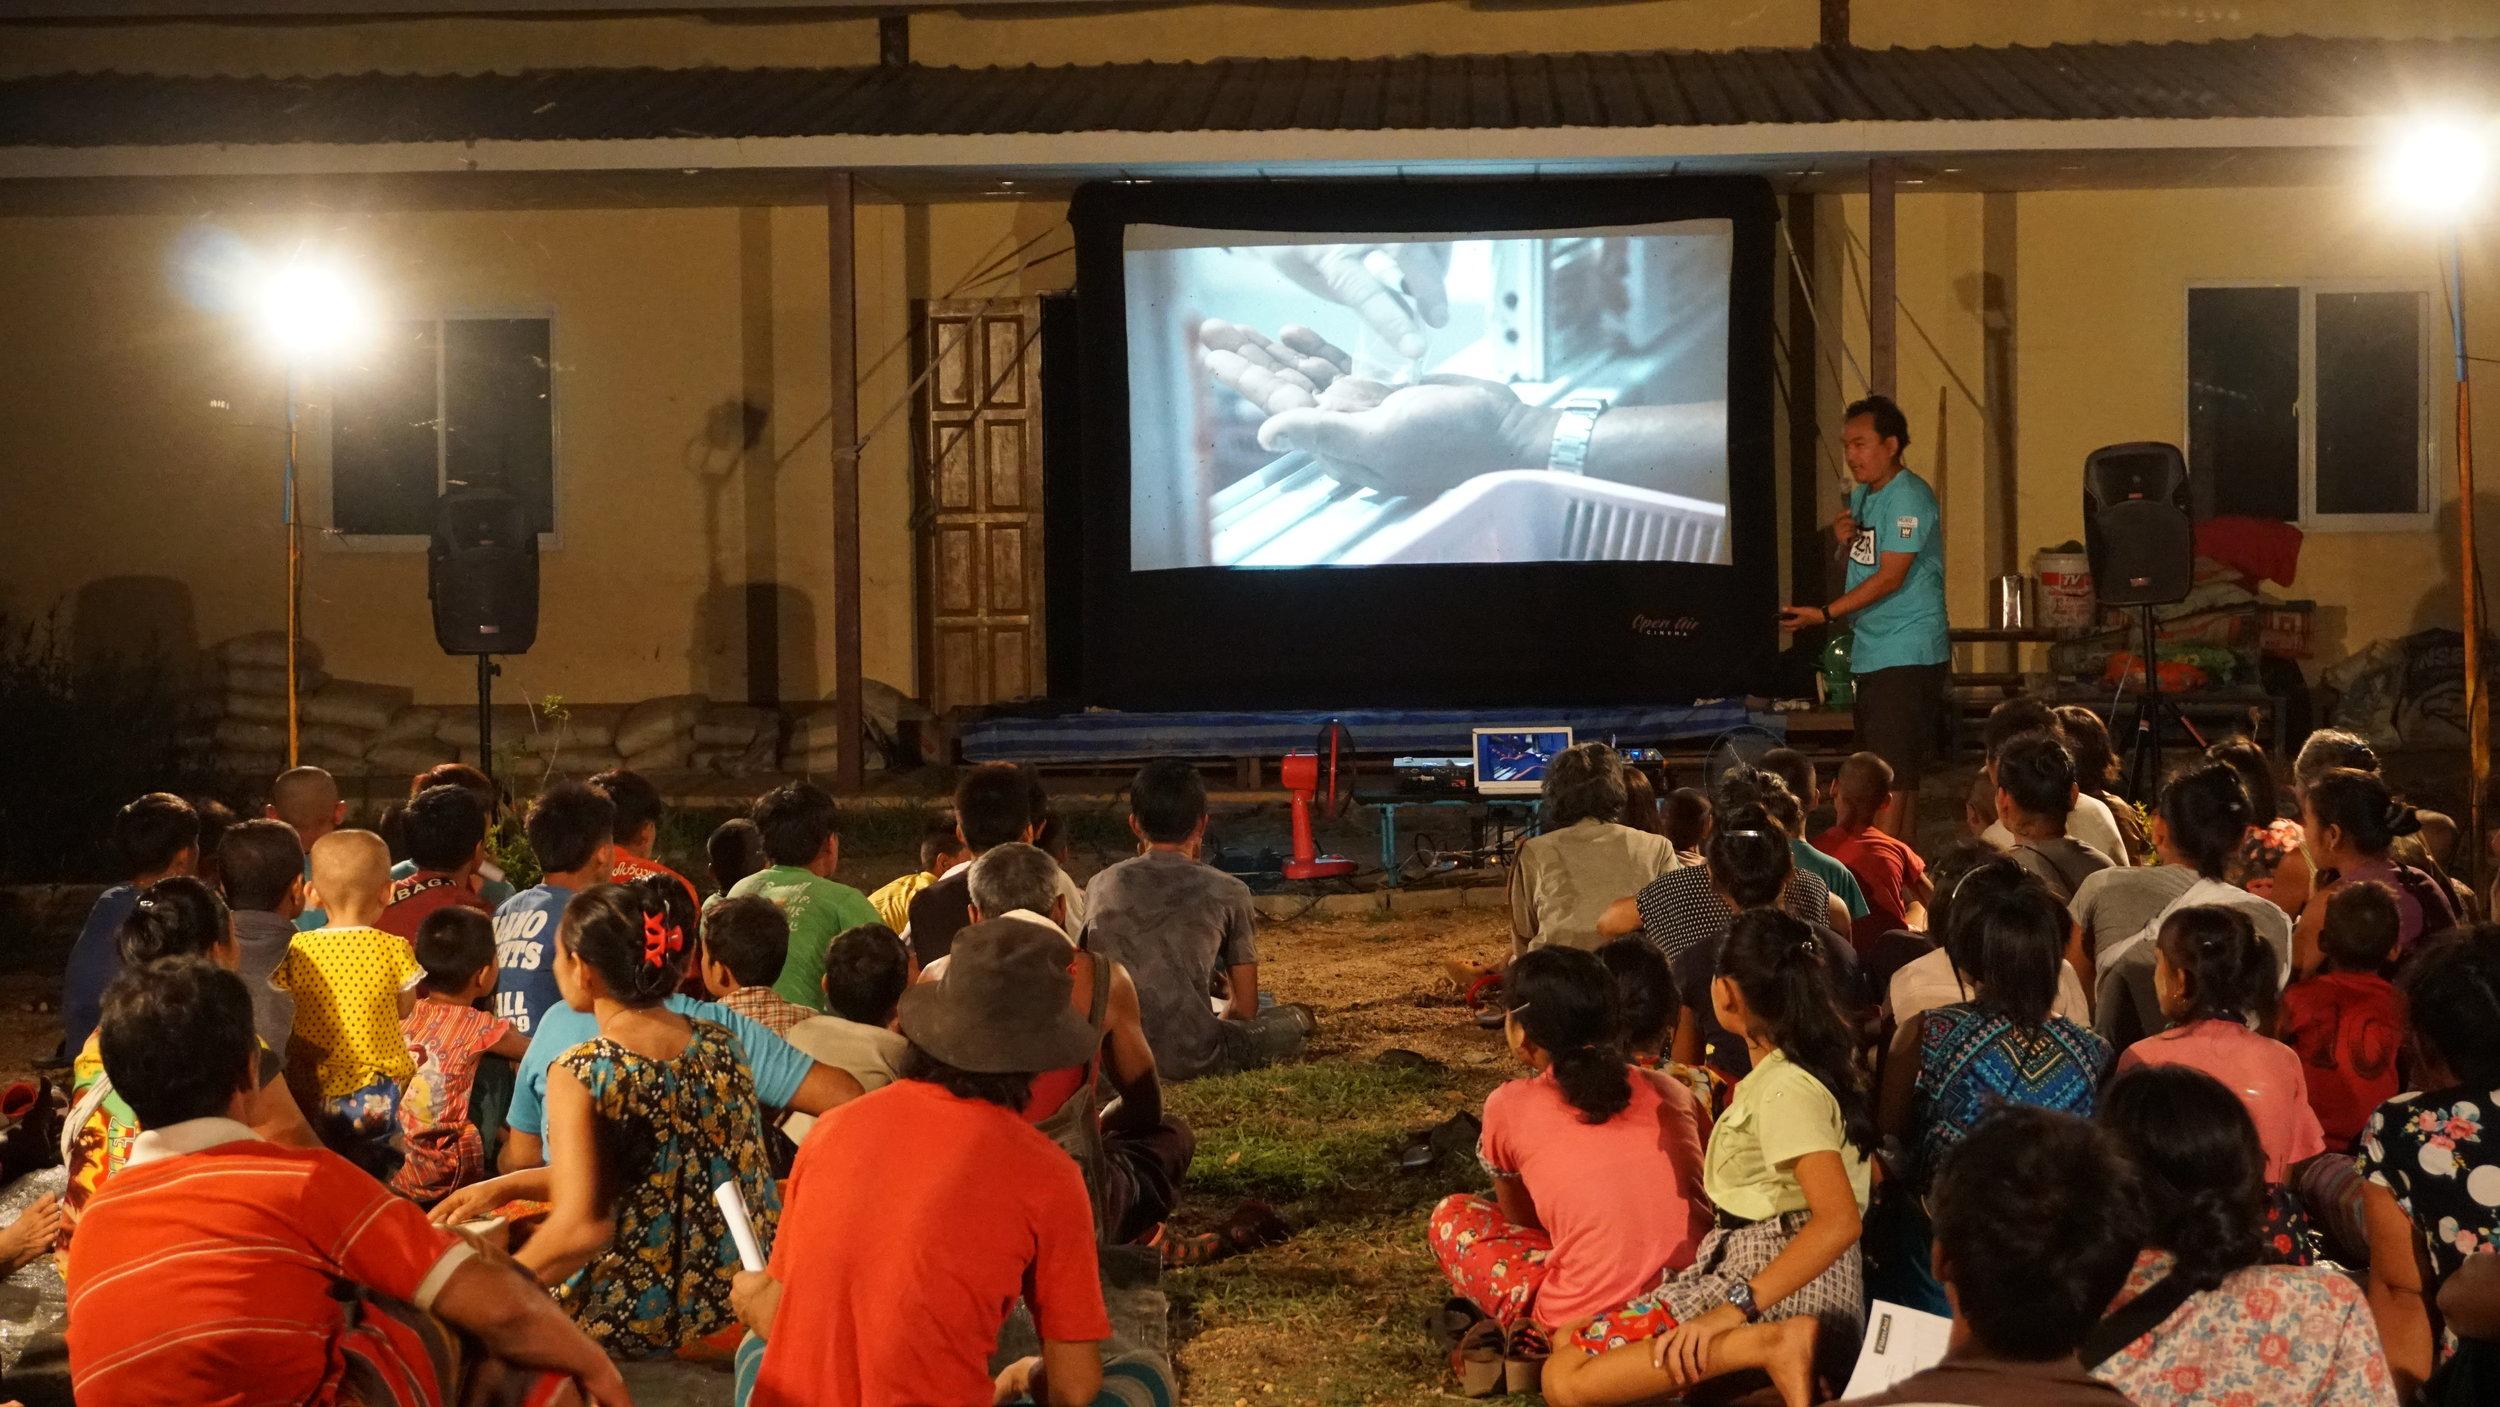 Evening screening in Htee Law Shu village